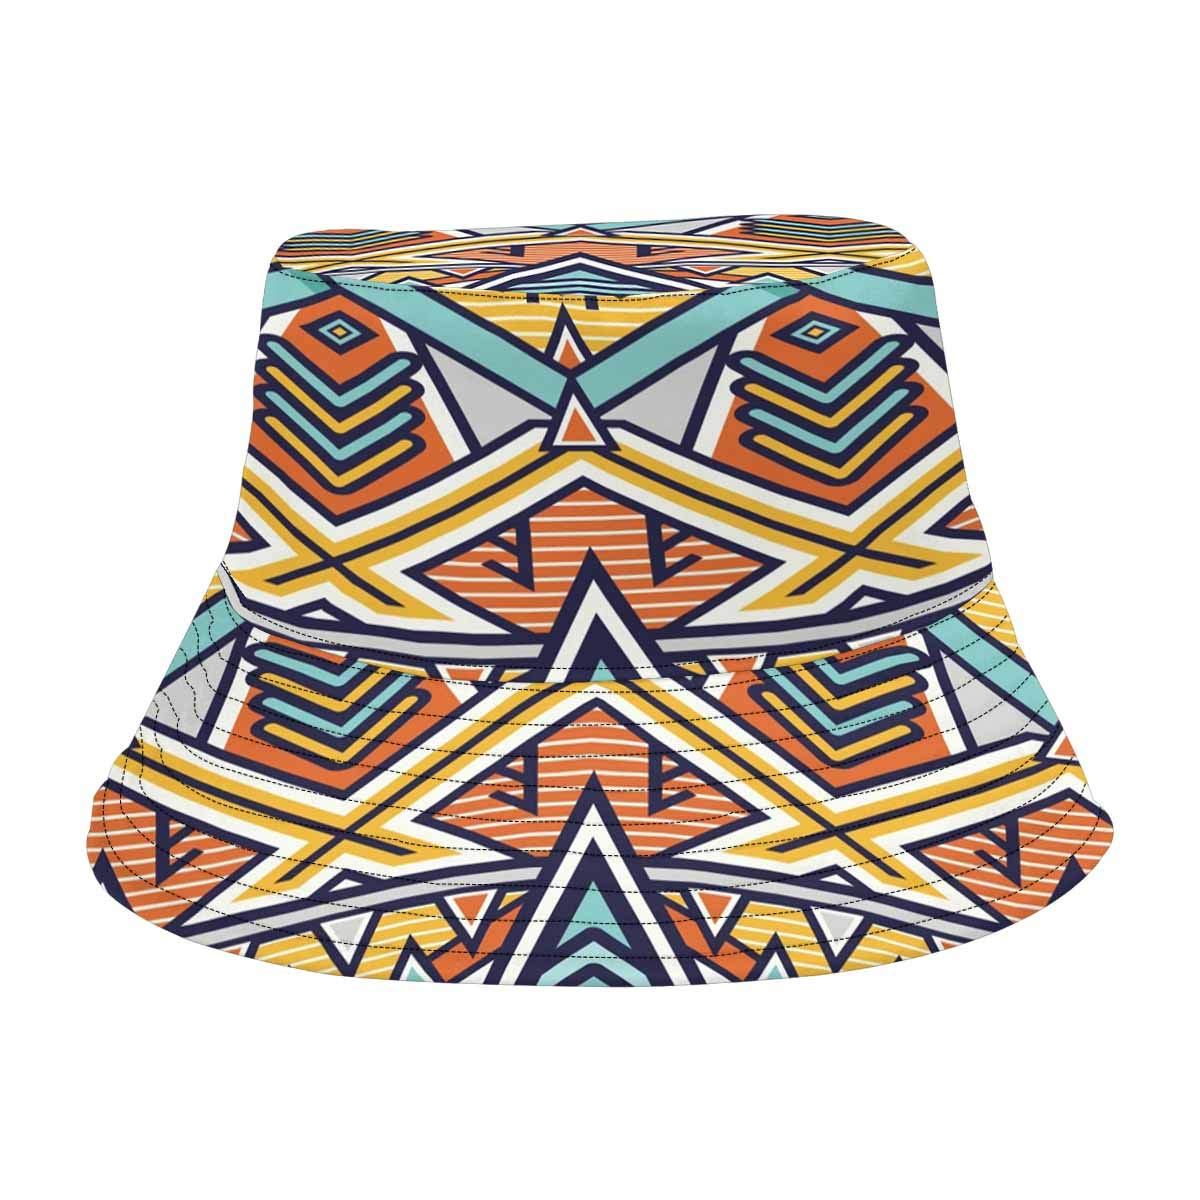 538e76e37b8f1 INTERESTPRINT African Art Tribal Print Bucket Hats Outdoor Sun Hats at  Amazon Men s Clothing store